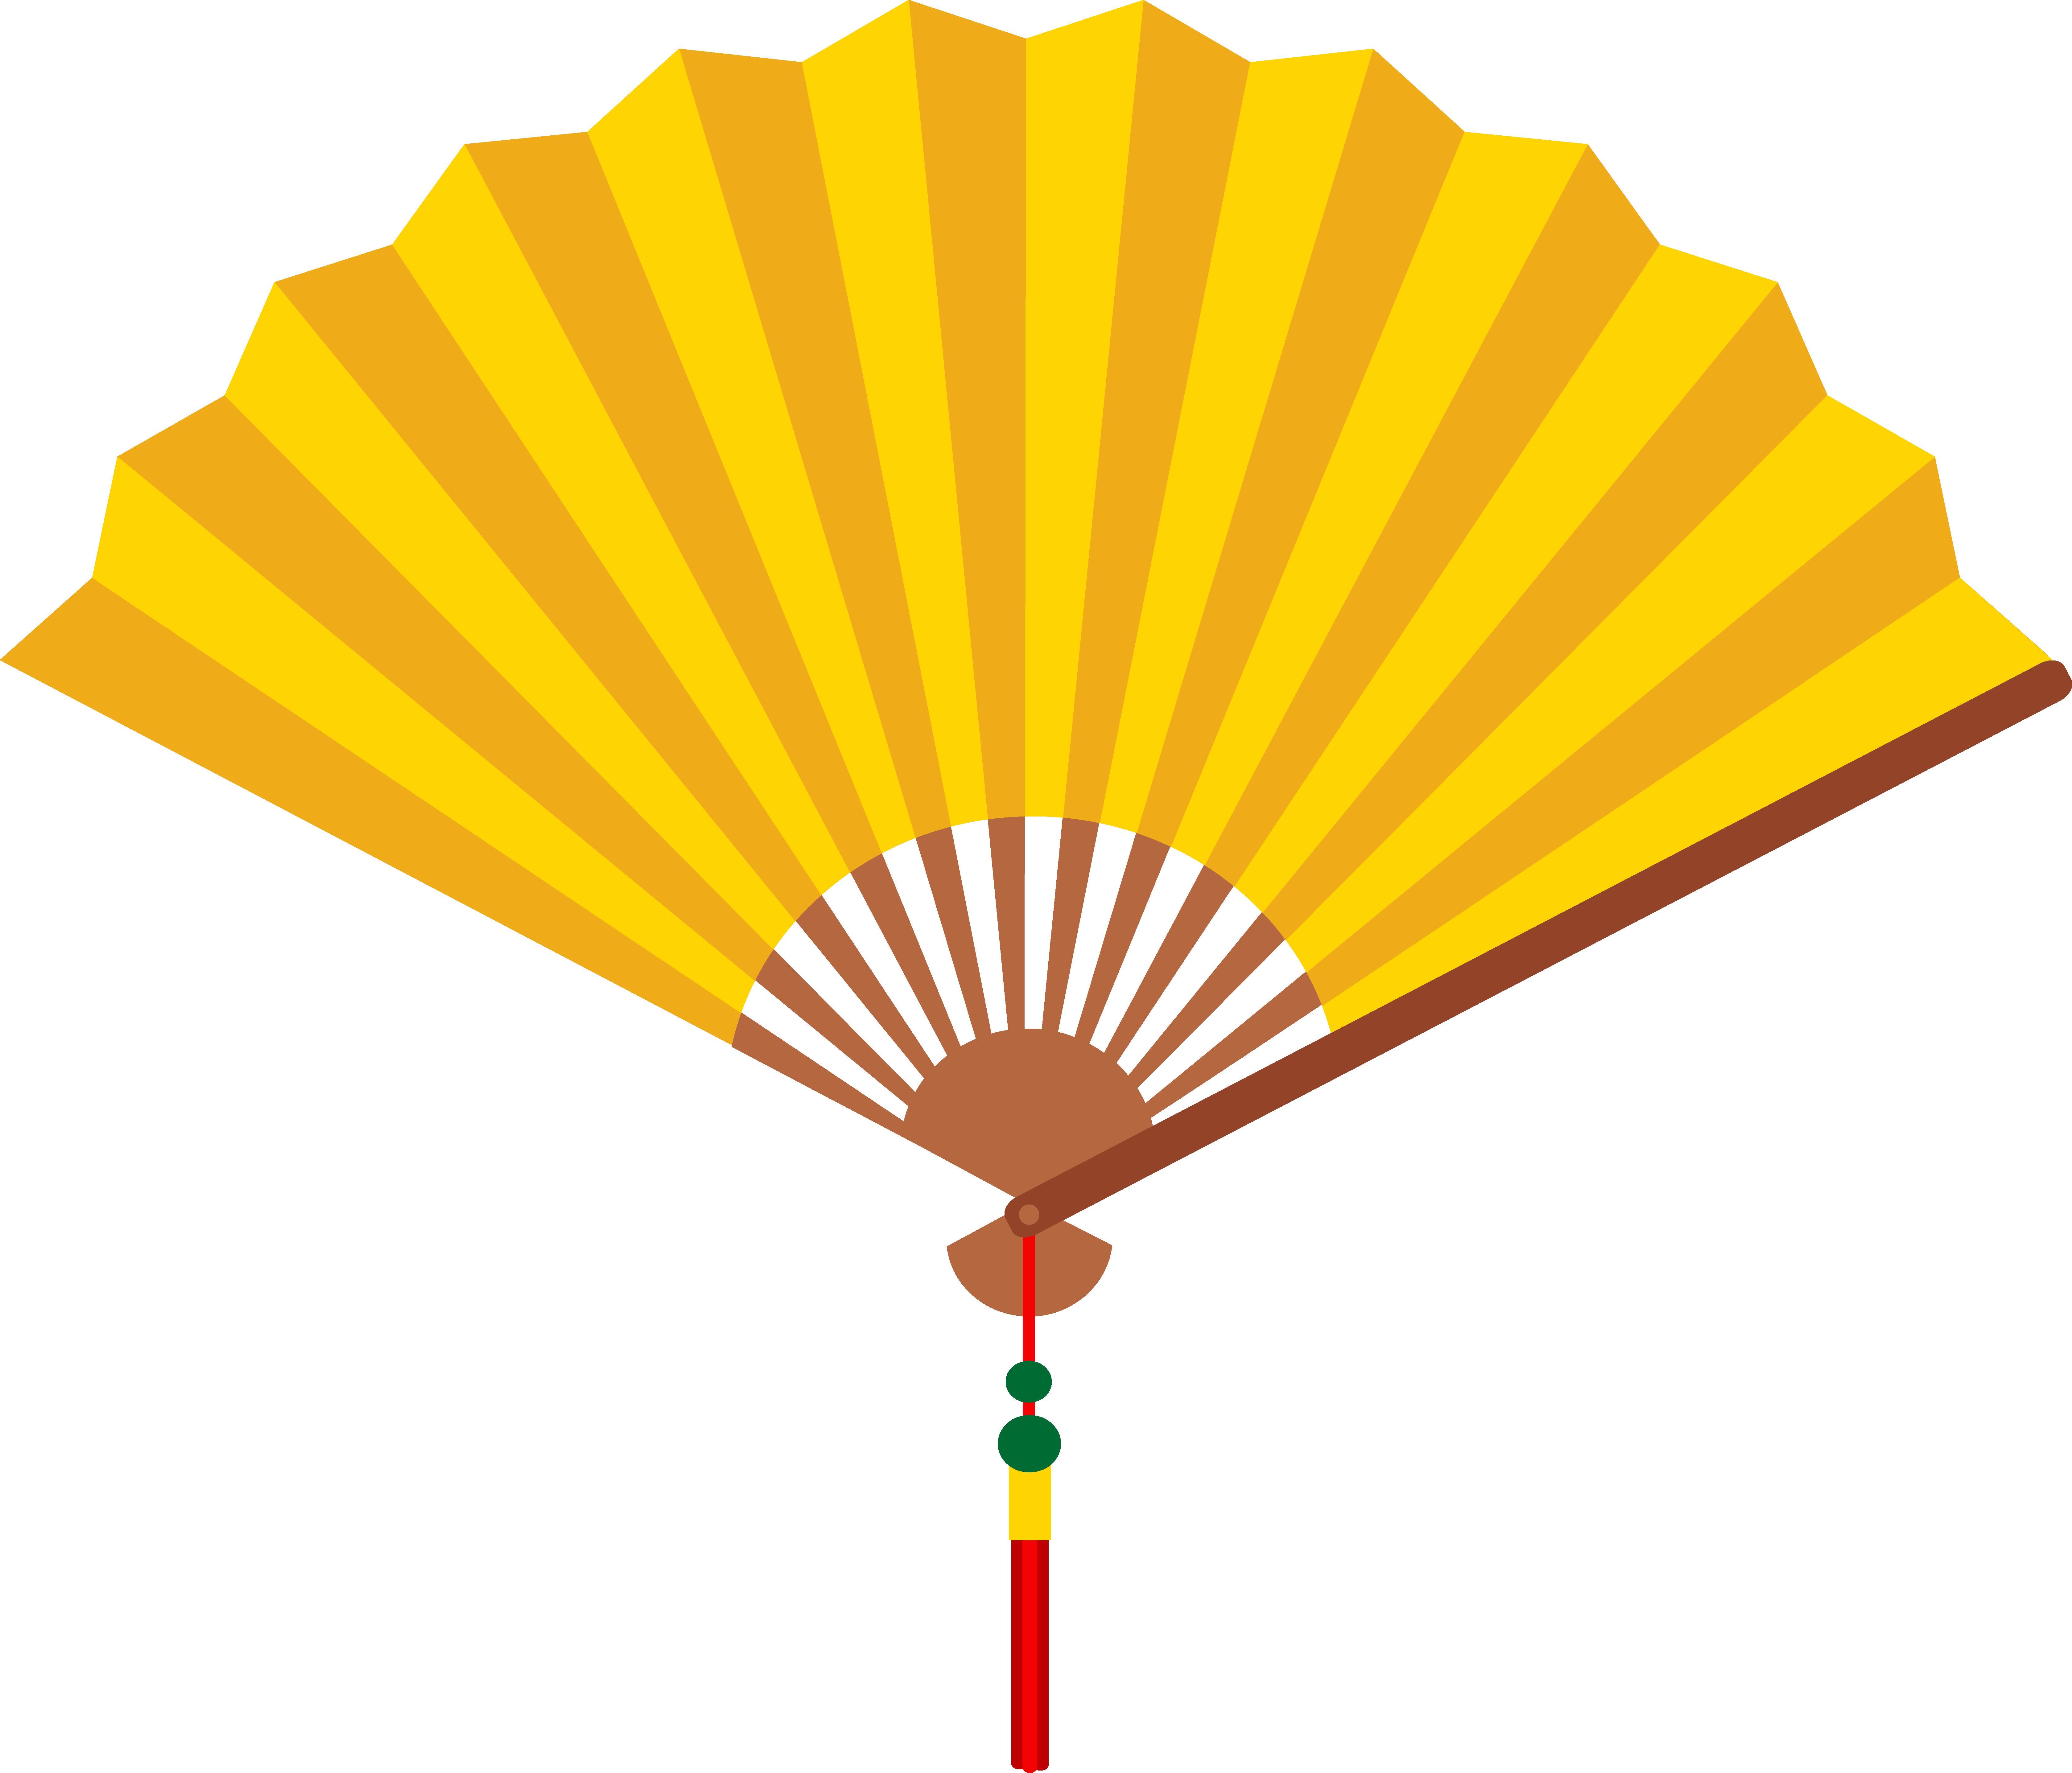 Free Asian Cliparts, Download Free Clip Art, Free Clip Art.